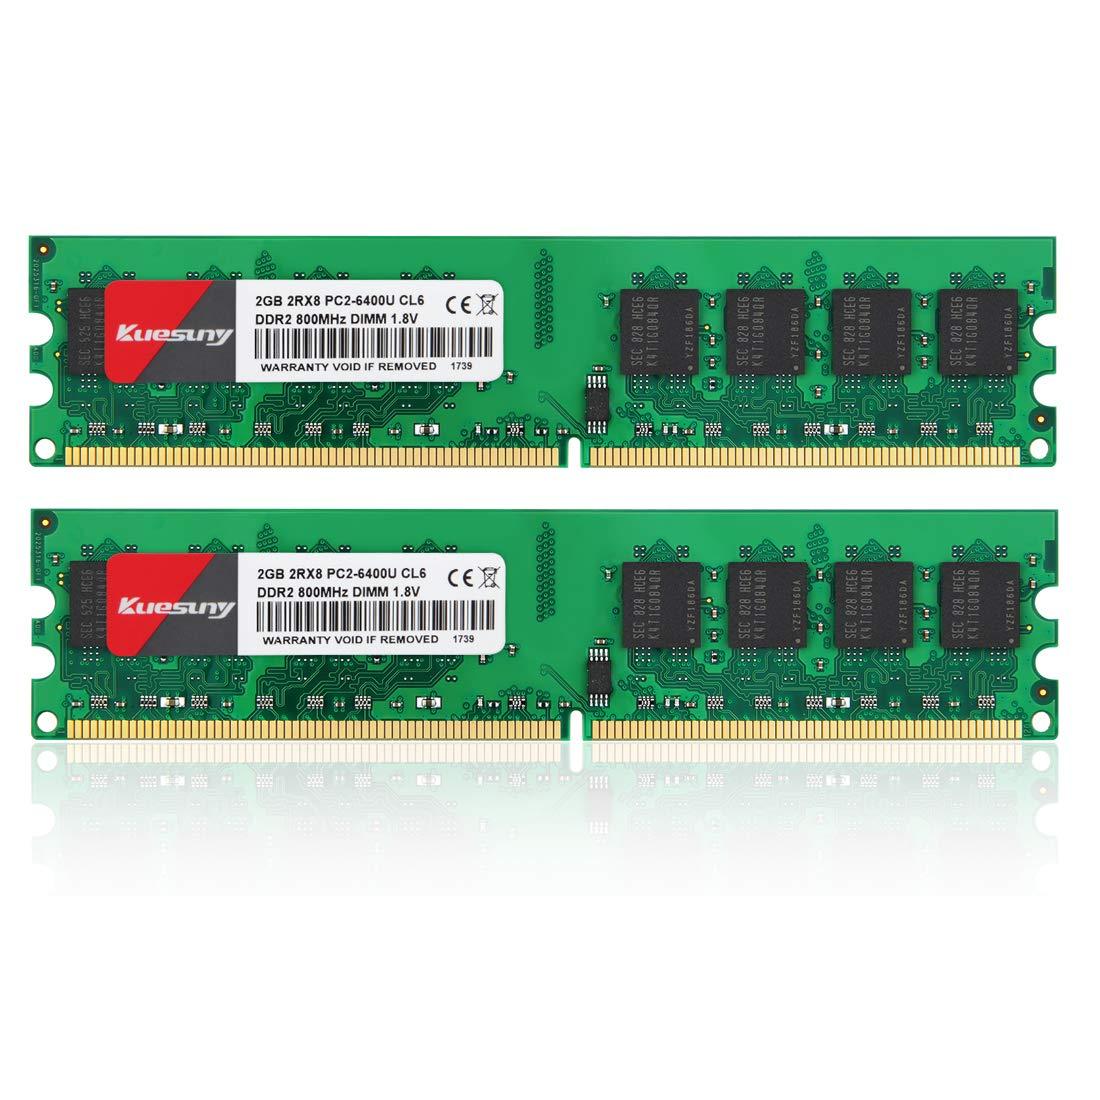 Memoria RAM 4GB Kit (2GBX2) DDR2 800 Udimm Kuesuny PC2-6400/PC2-6400U 1.8V CL6 240 Pin Non-ECC Unbuffered Modules